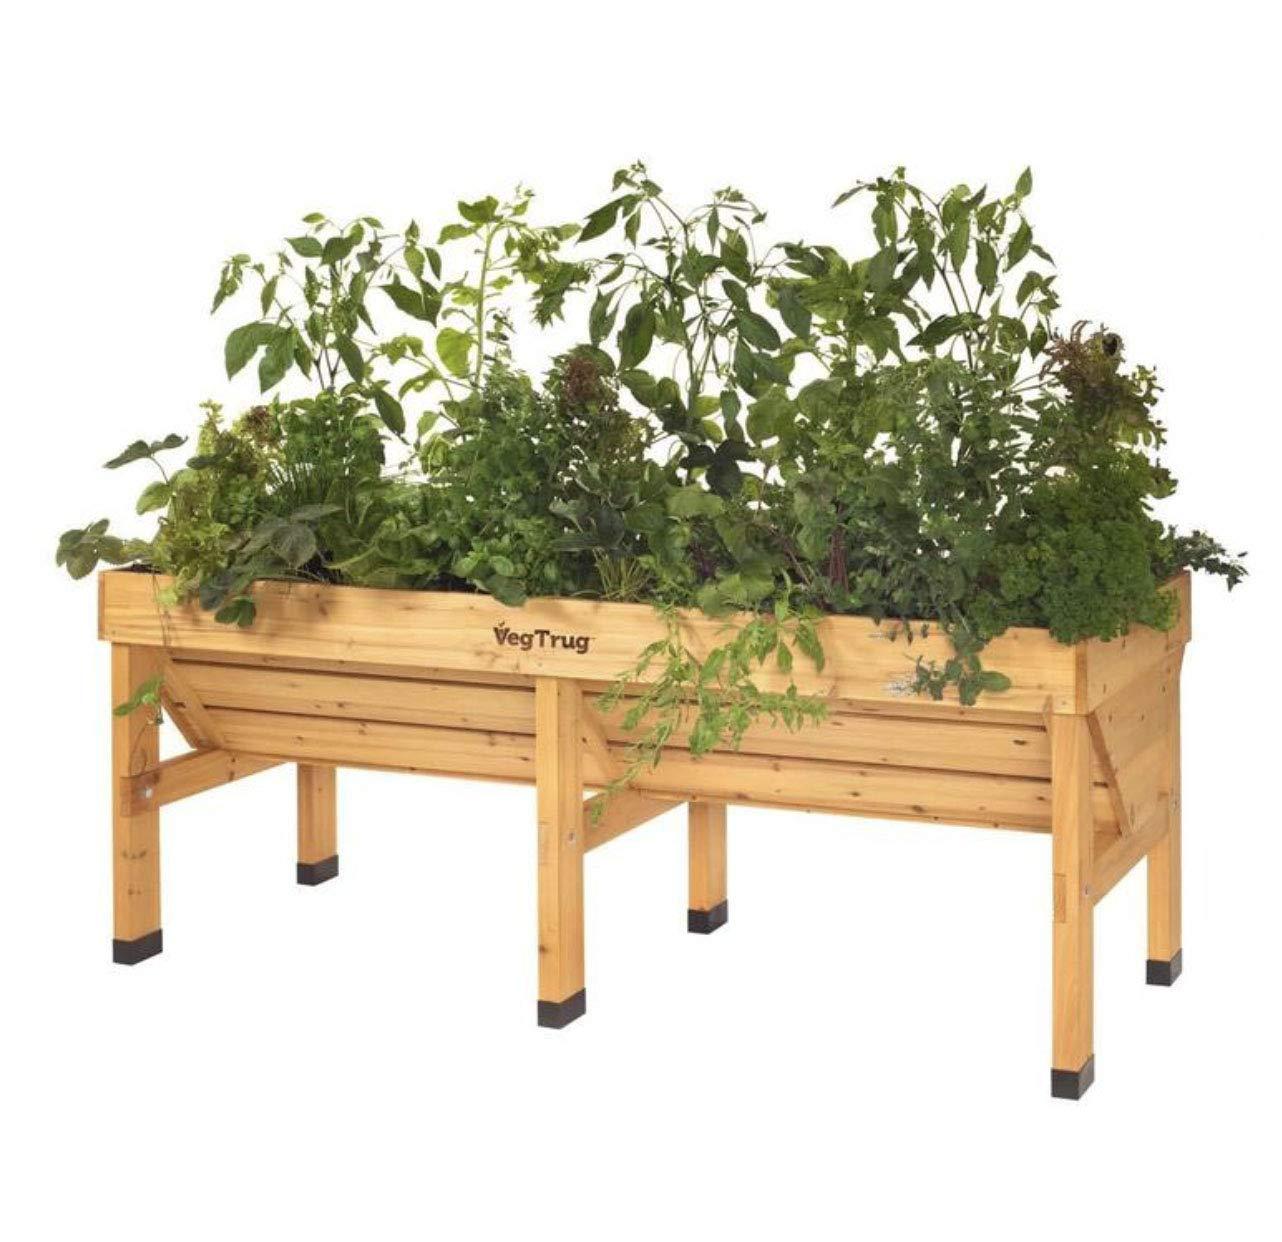 vegtrug cover